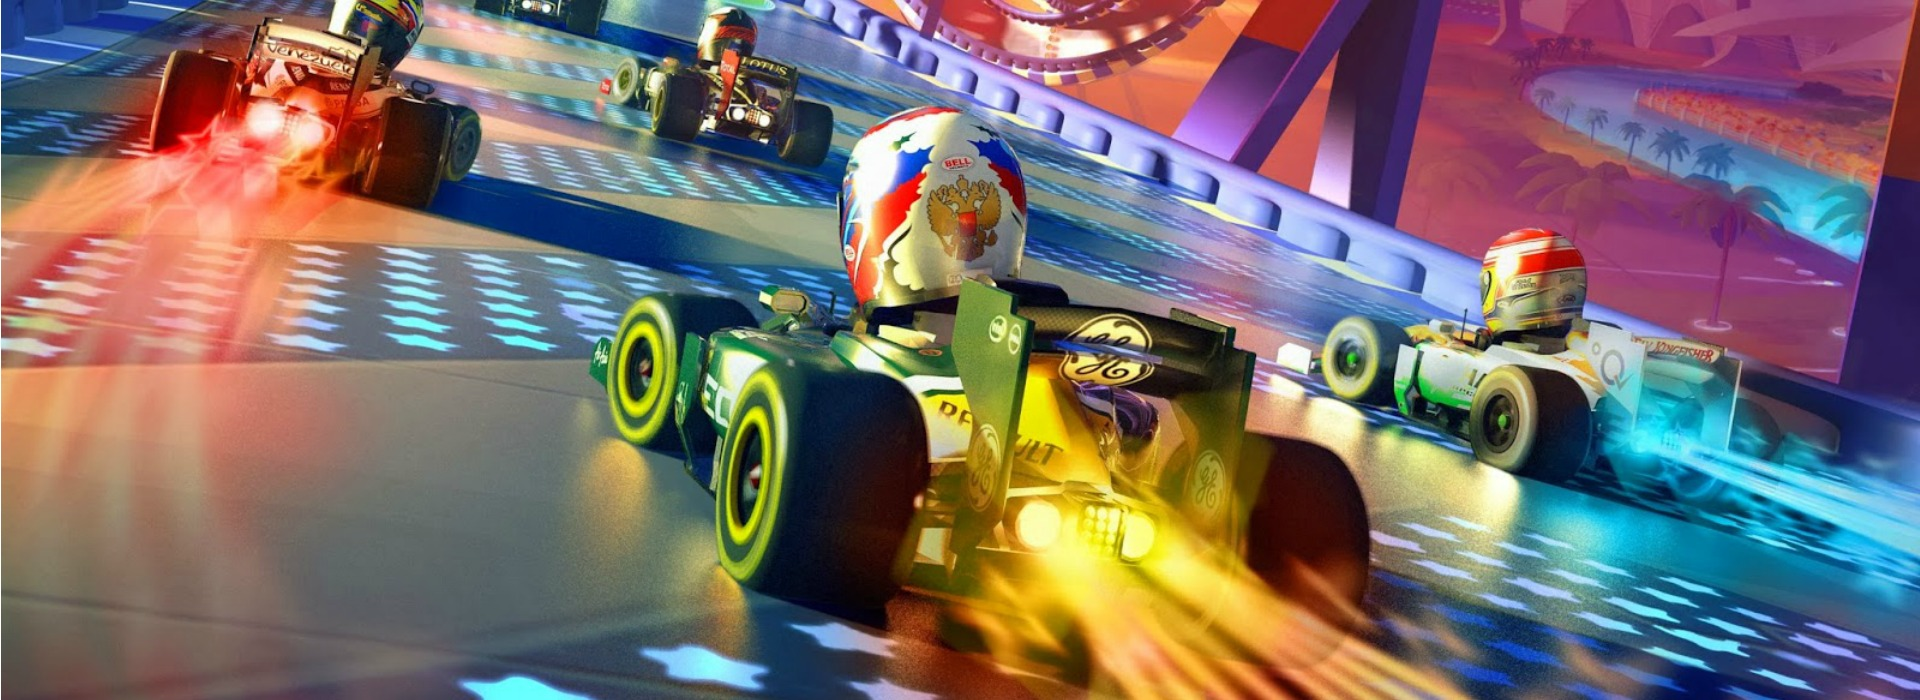 f1-race-stars-banner